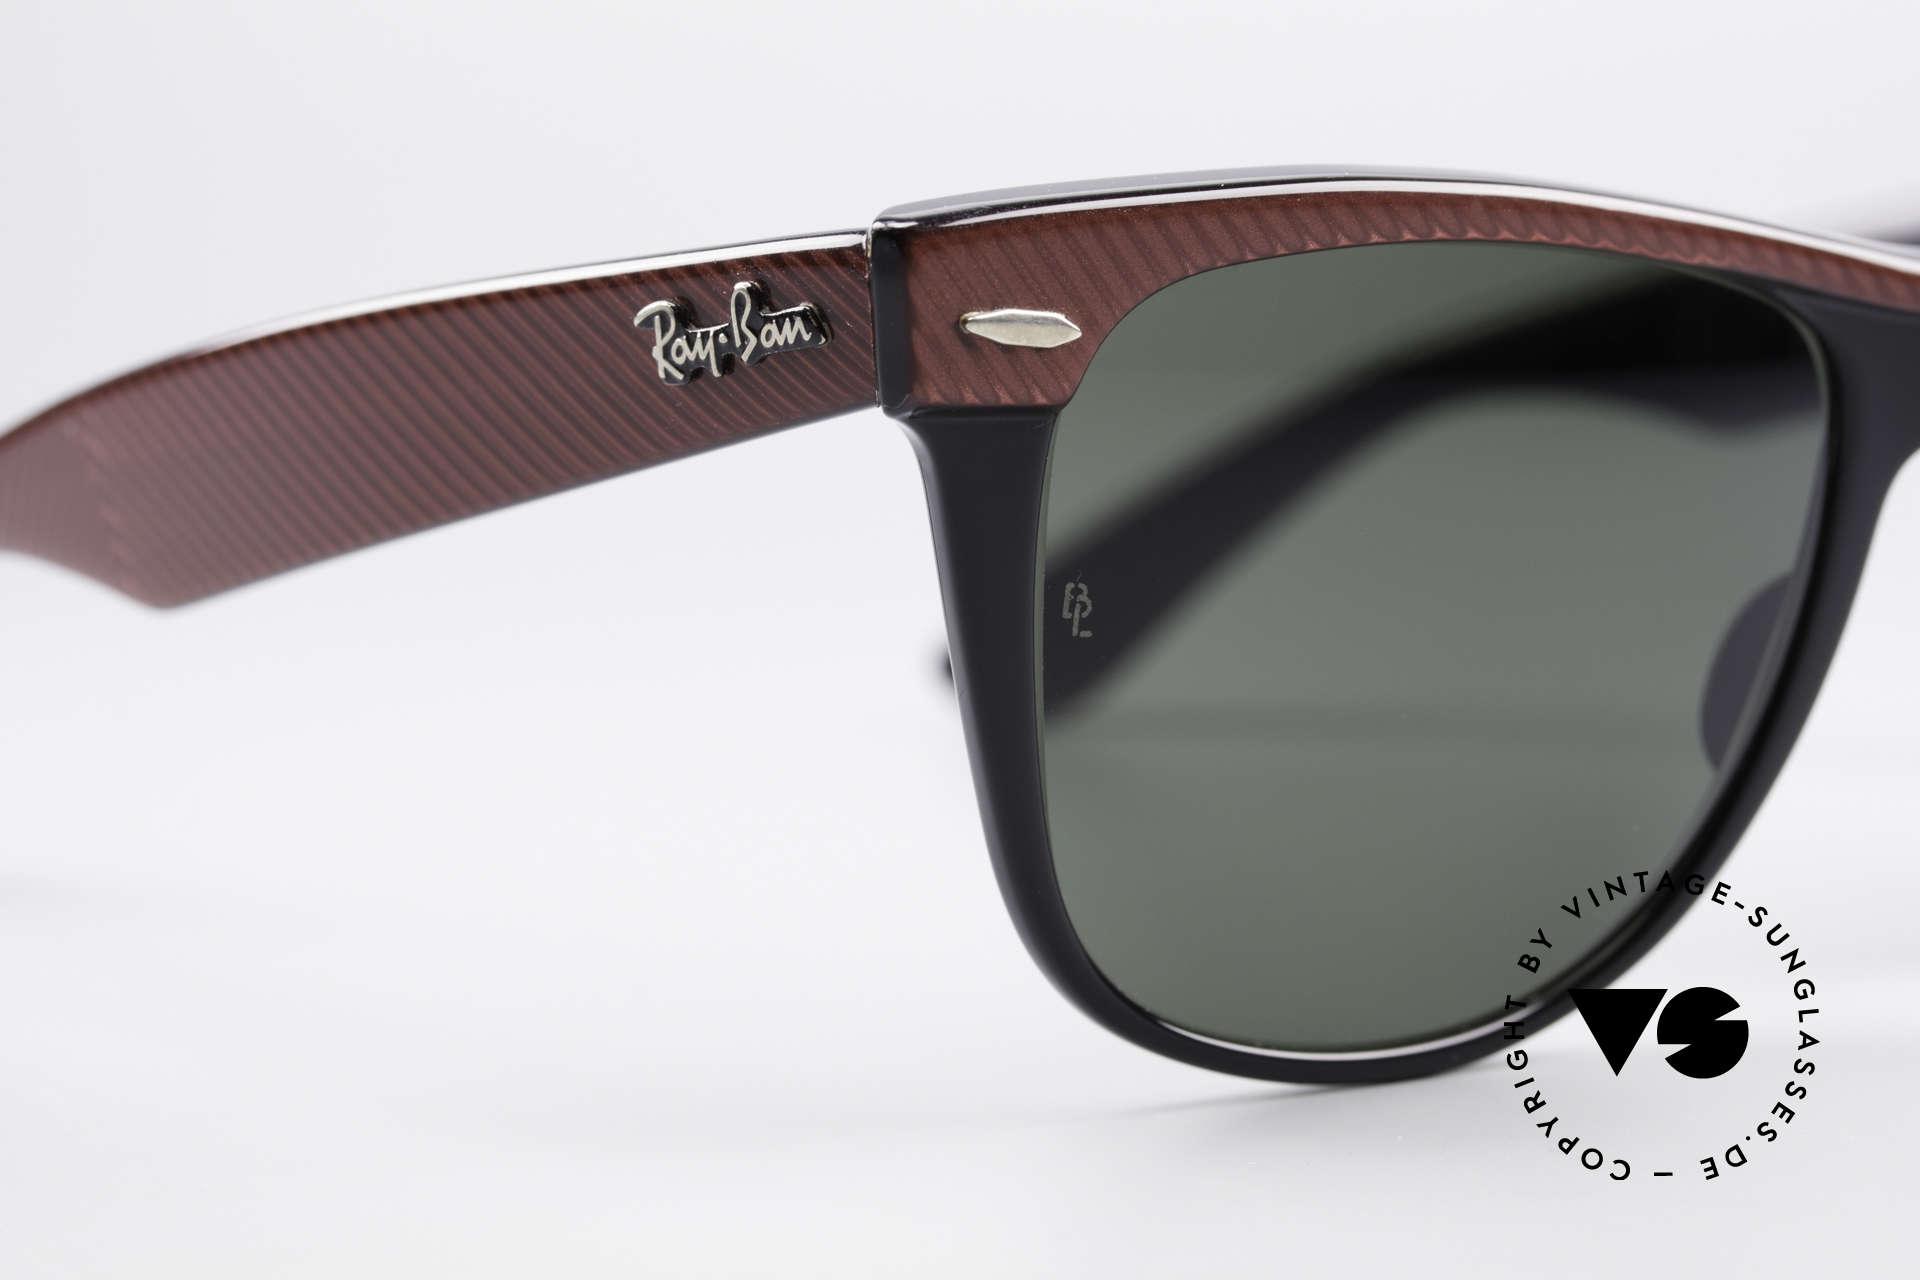 Ray Ban Wayfarer II Original USA Wayfarer B&L, NO RETRO sunglasses, but an authentic old original, Made for Men and Women